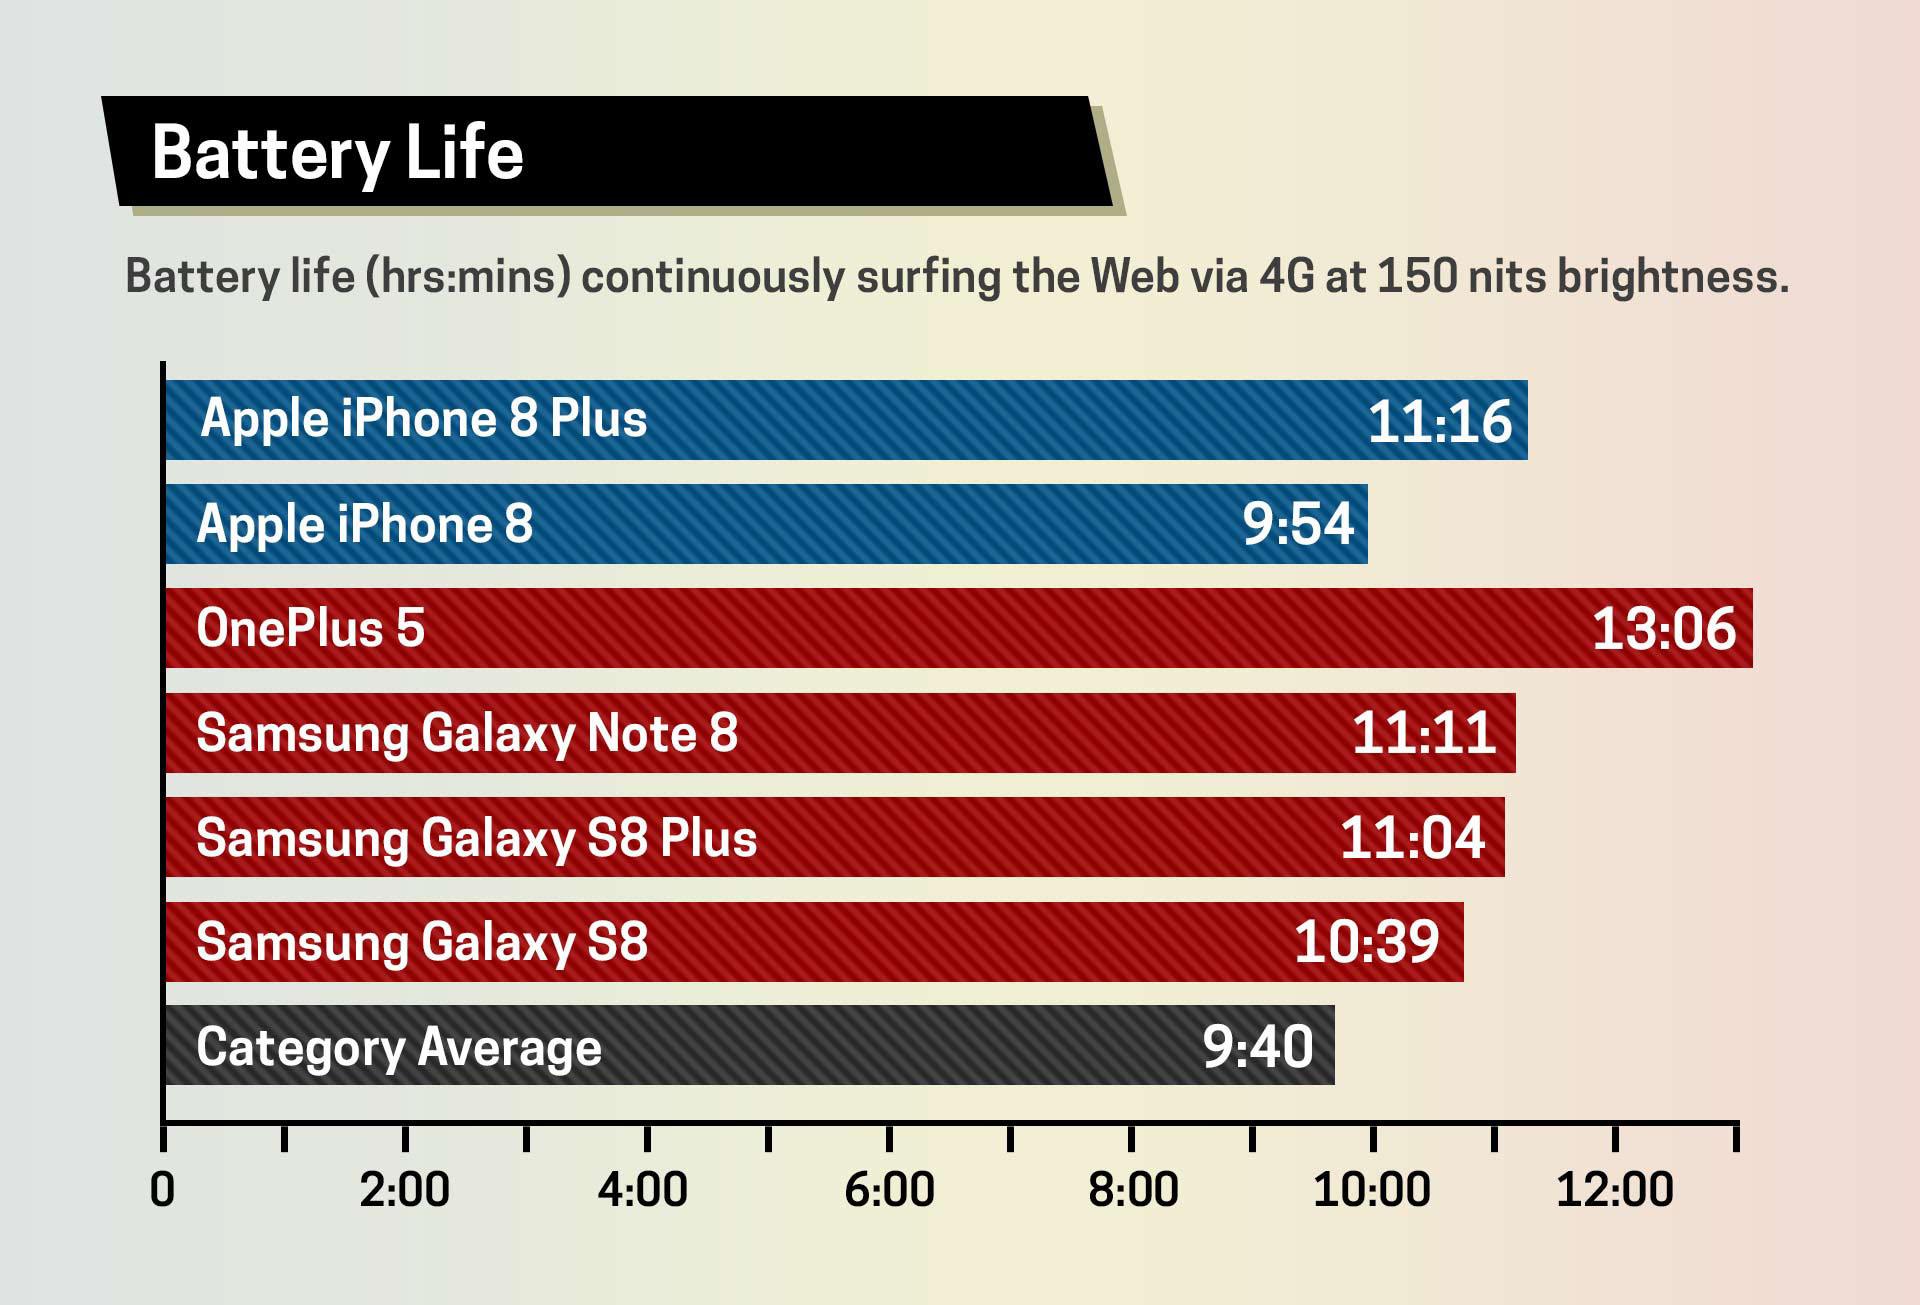 Работа аккумуляторов iPhone 8 и Samsung Galaxy S8